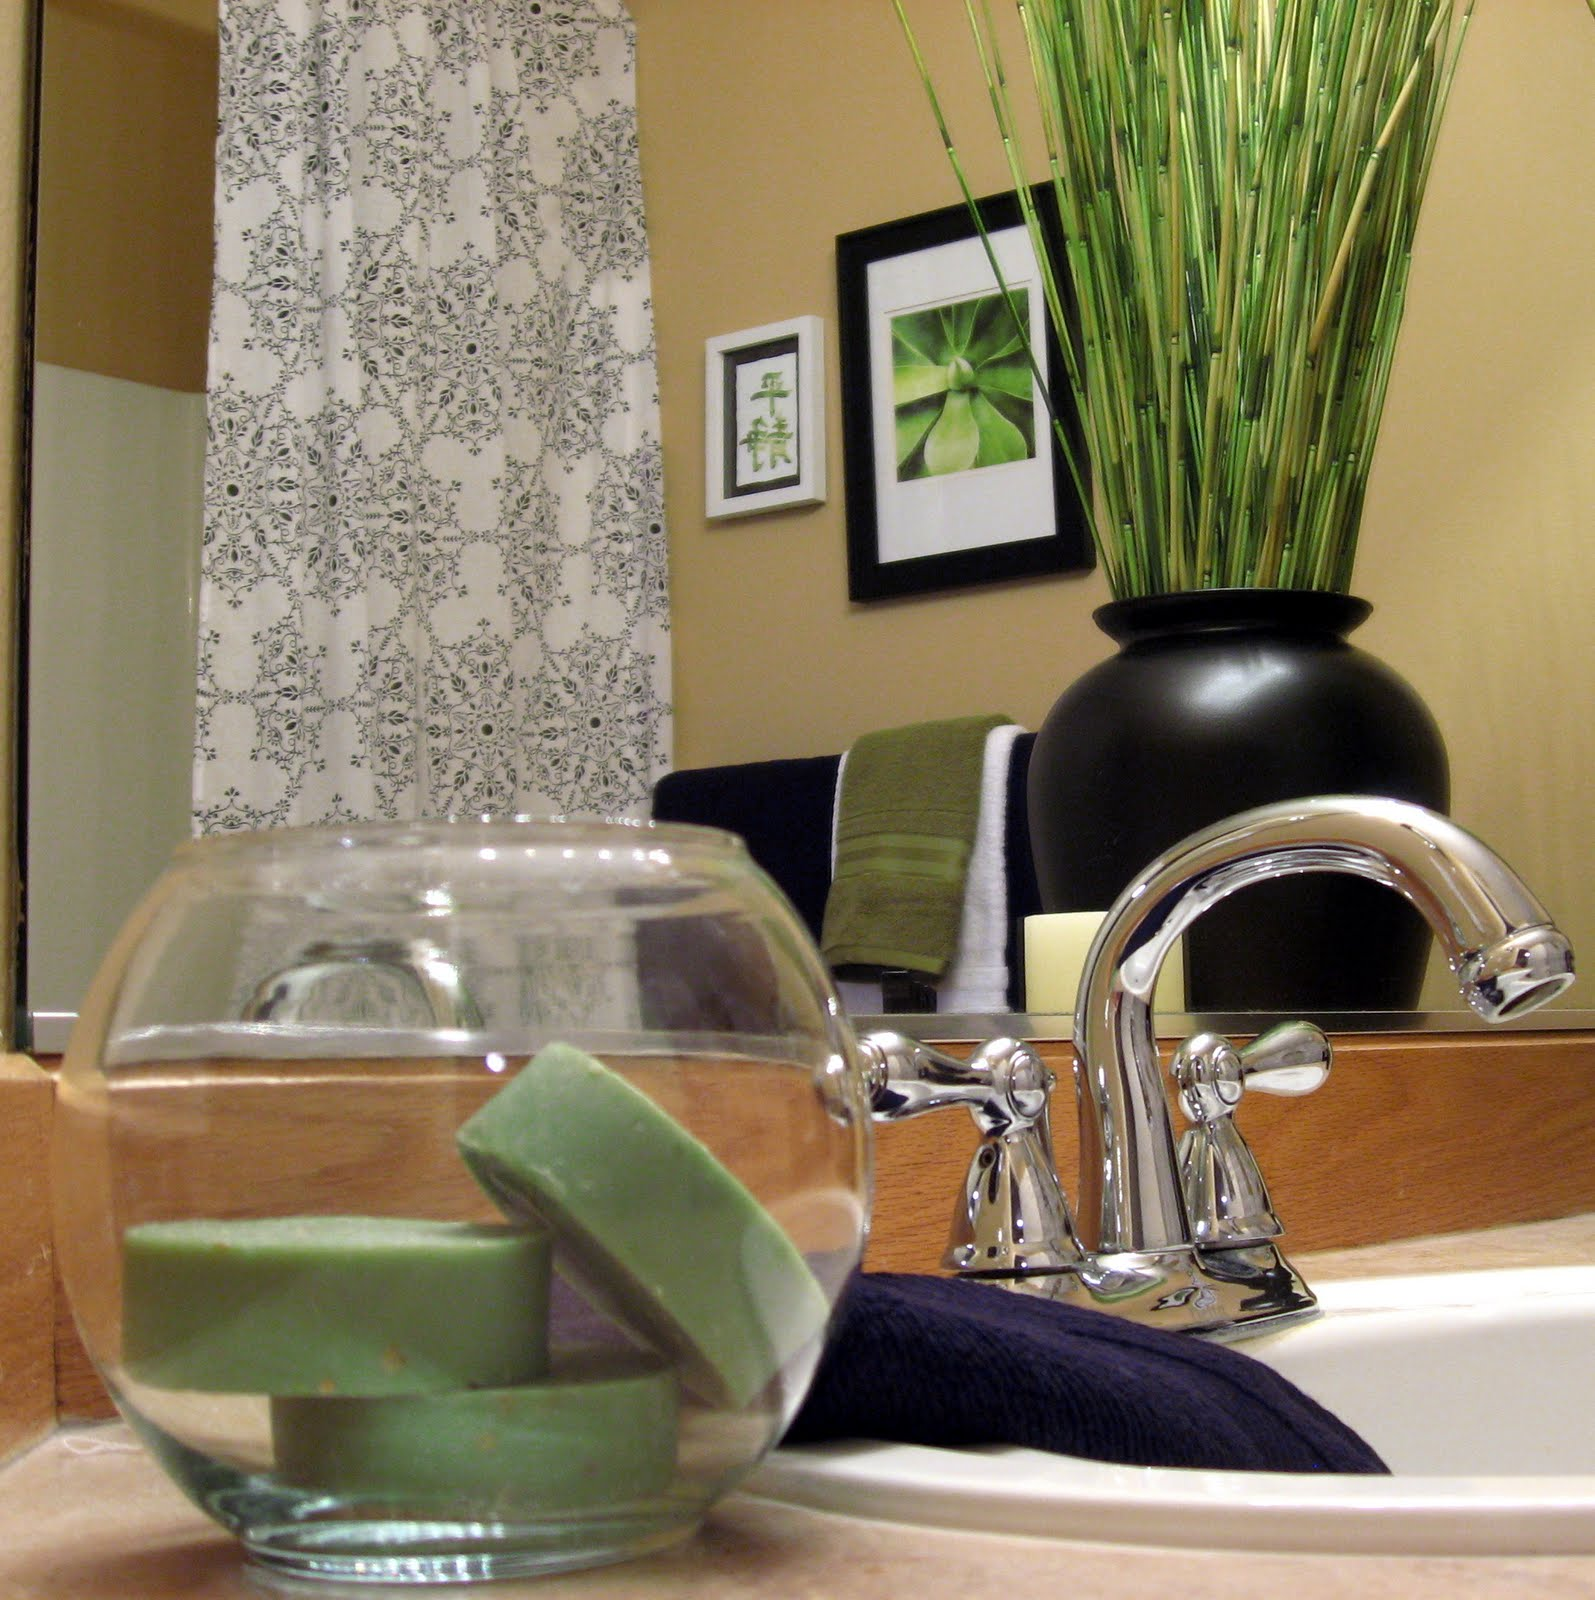 Home Bathroom Spa Accessories Photo 1